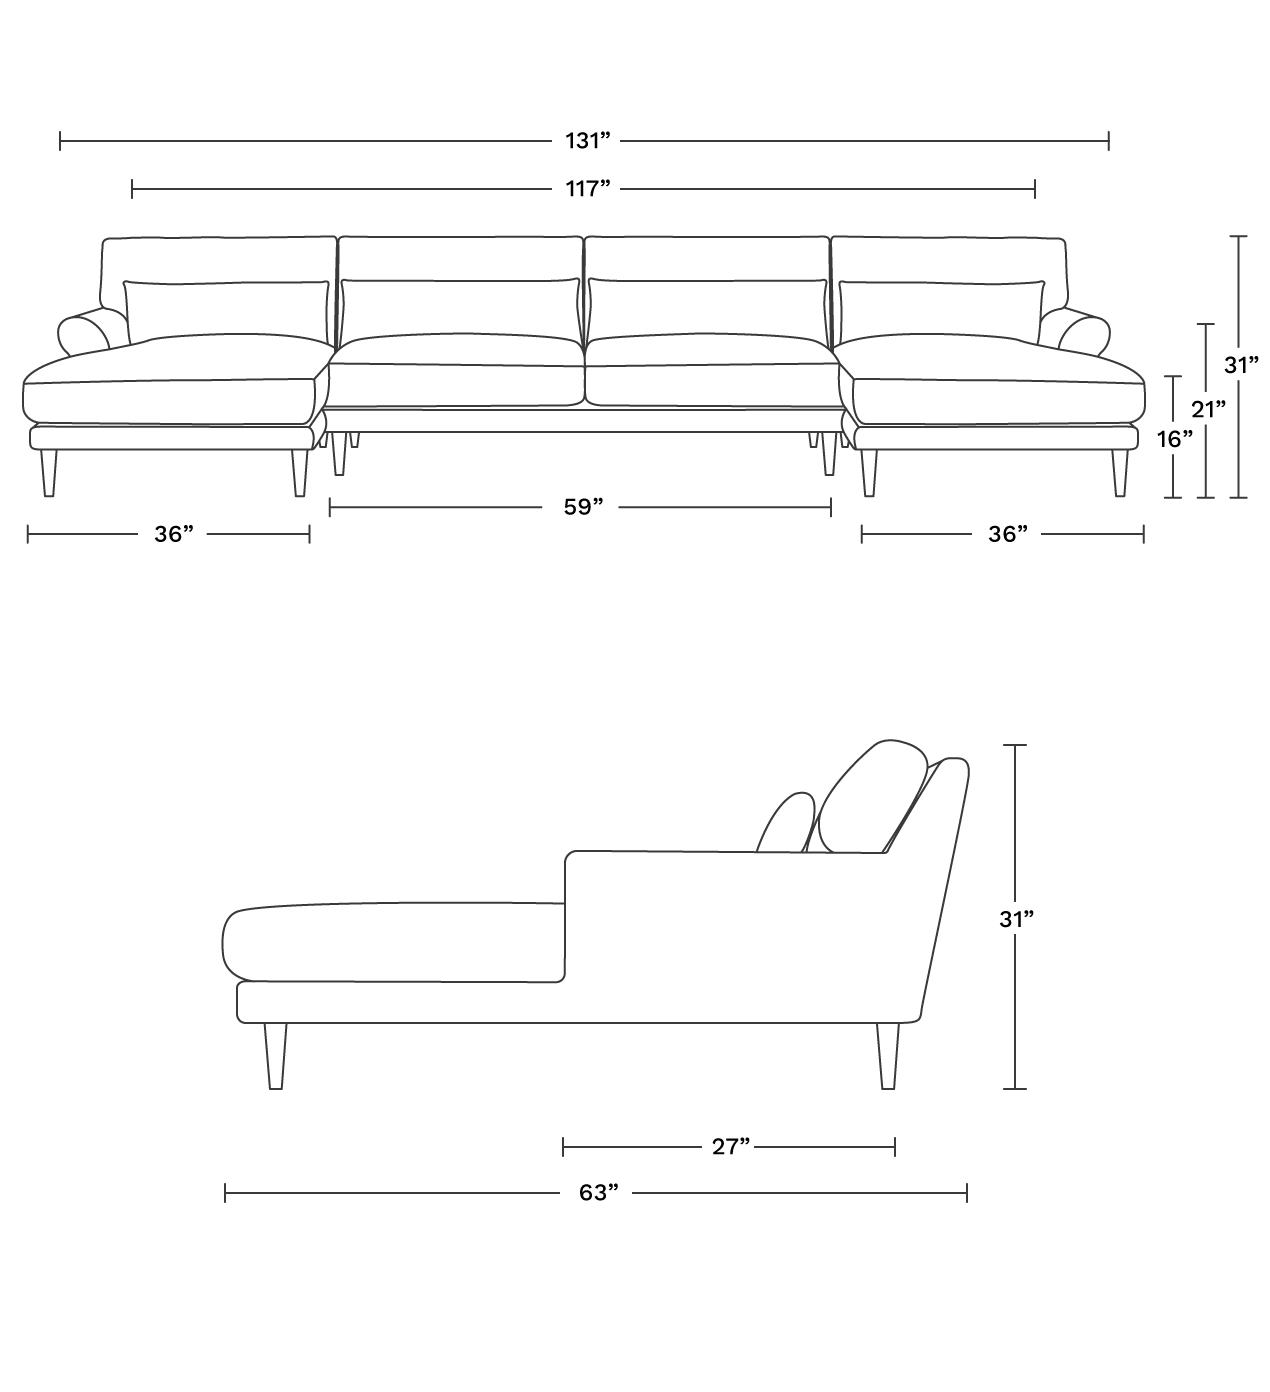 Best Exterior Design App: Best Interior Design Apps, Sectional Sofa, Best